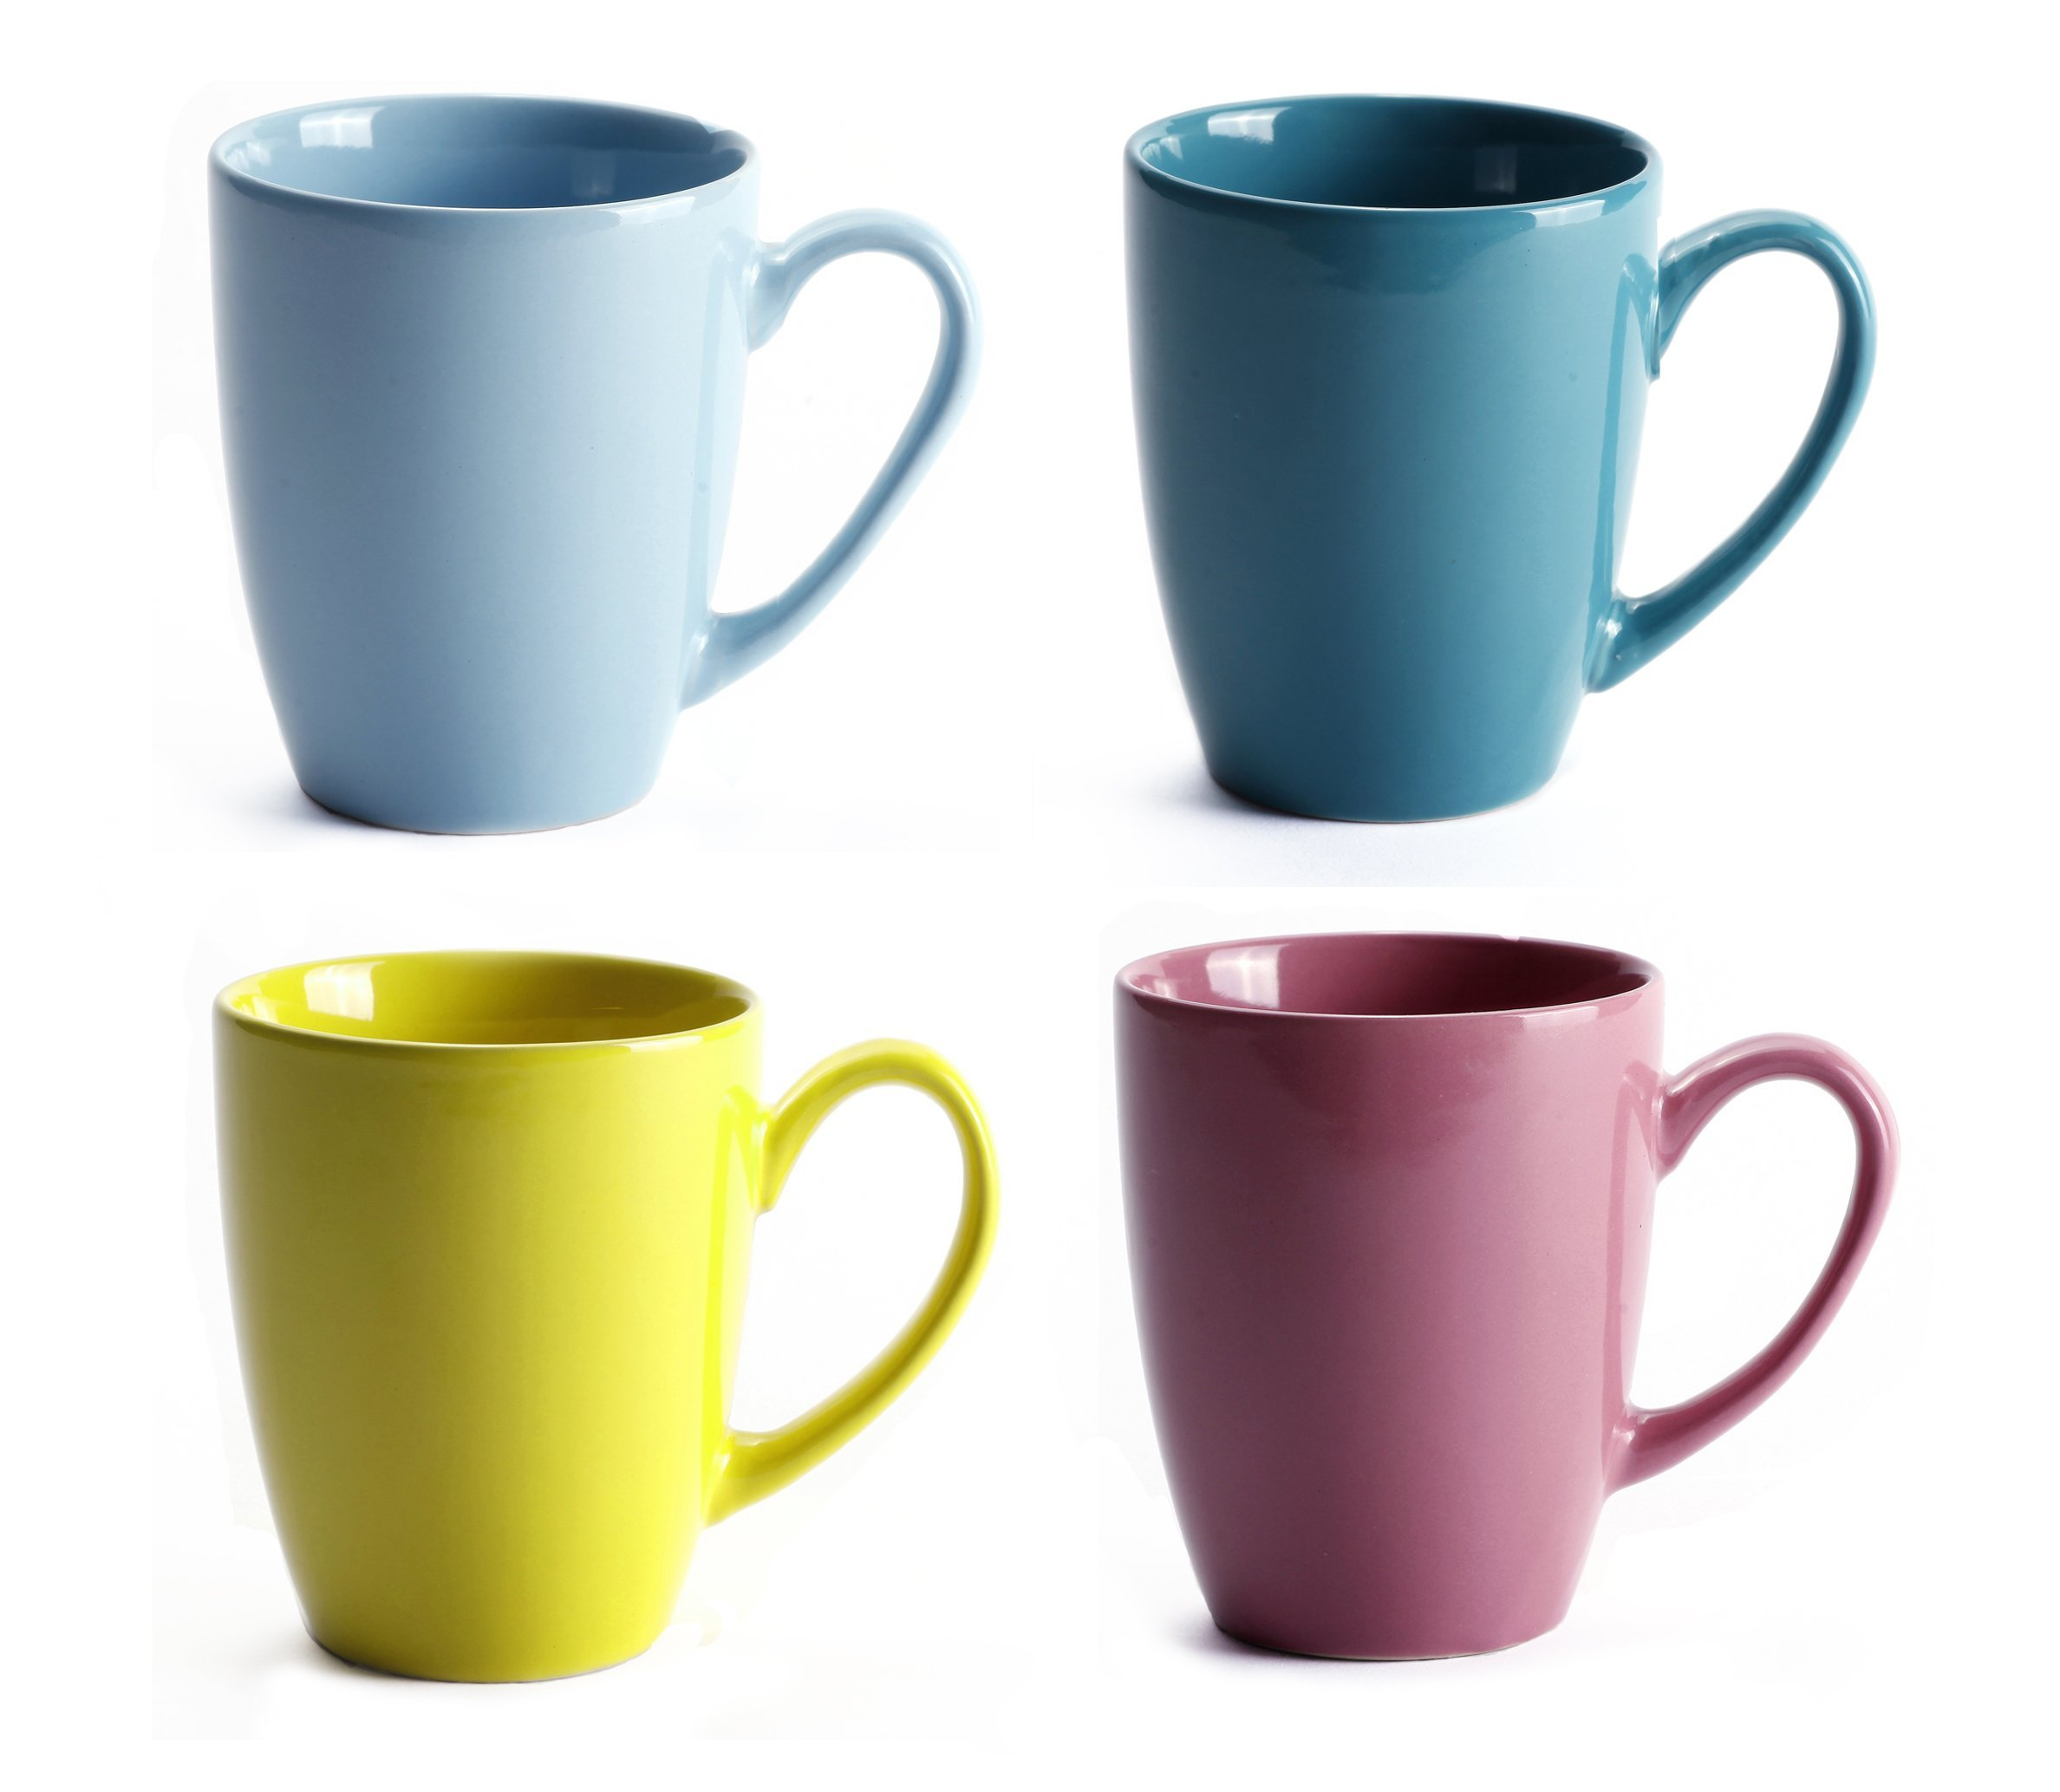 LEANDALE 12 OZ Ceramic Coffee Mug Tea Milk Cup Set of 4 Multi Solid Color